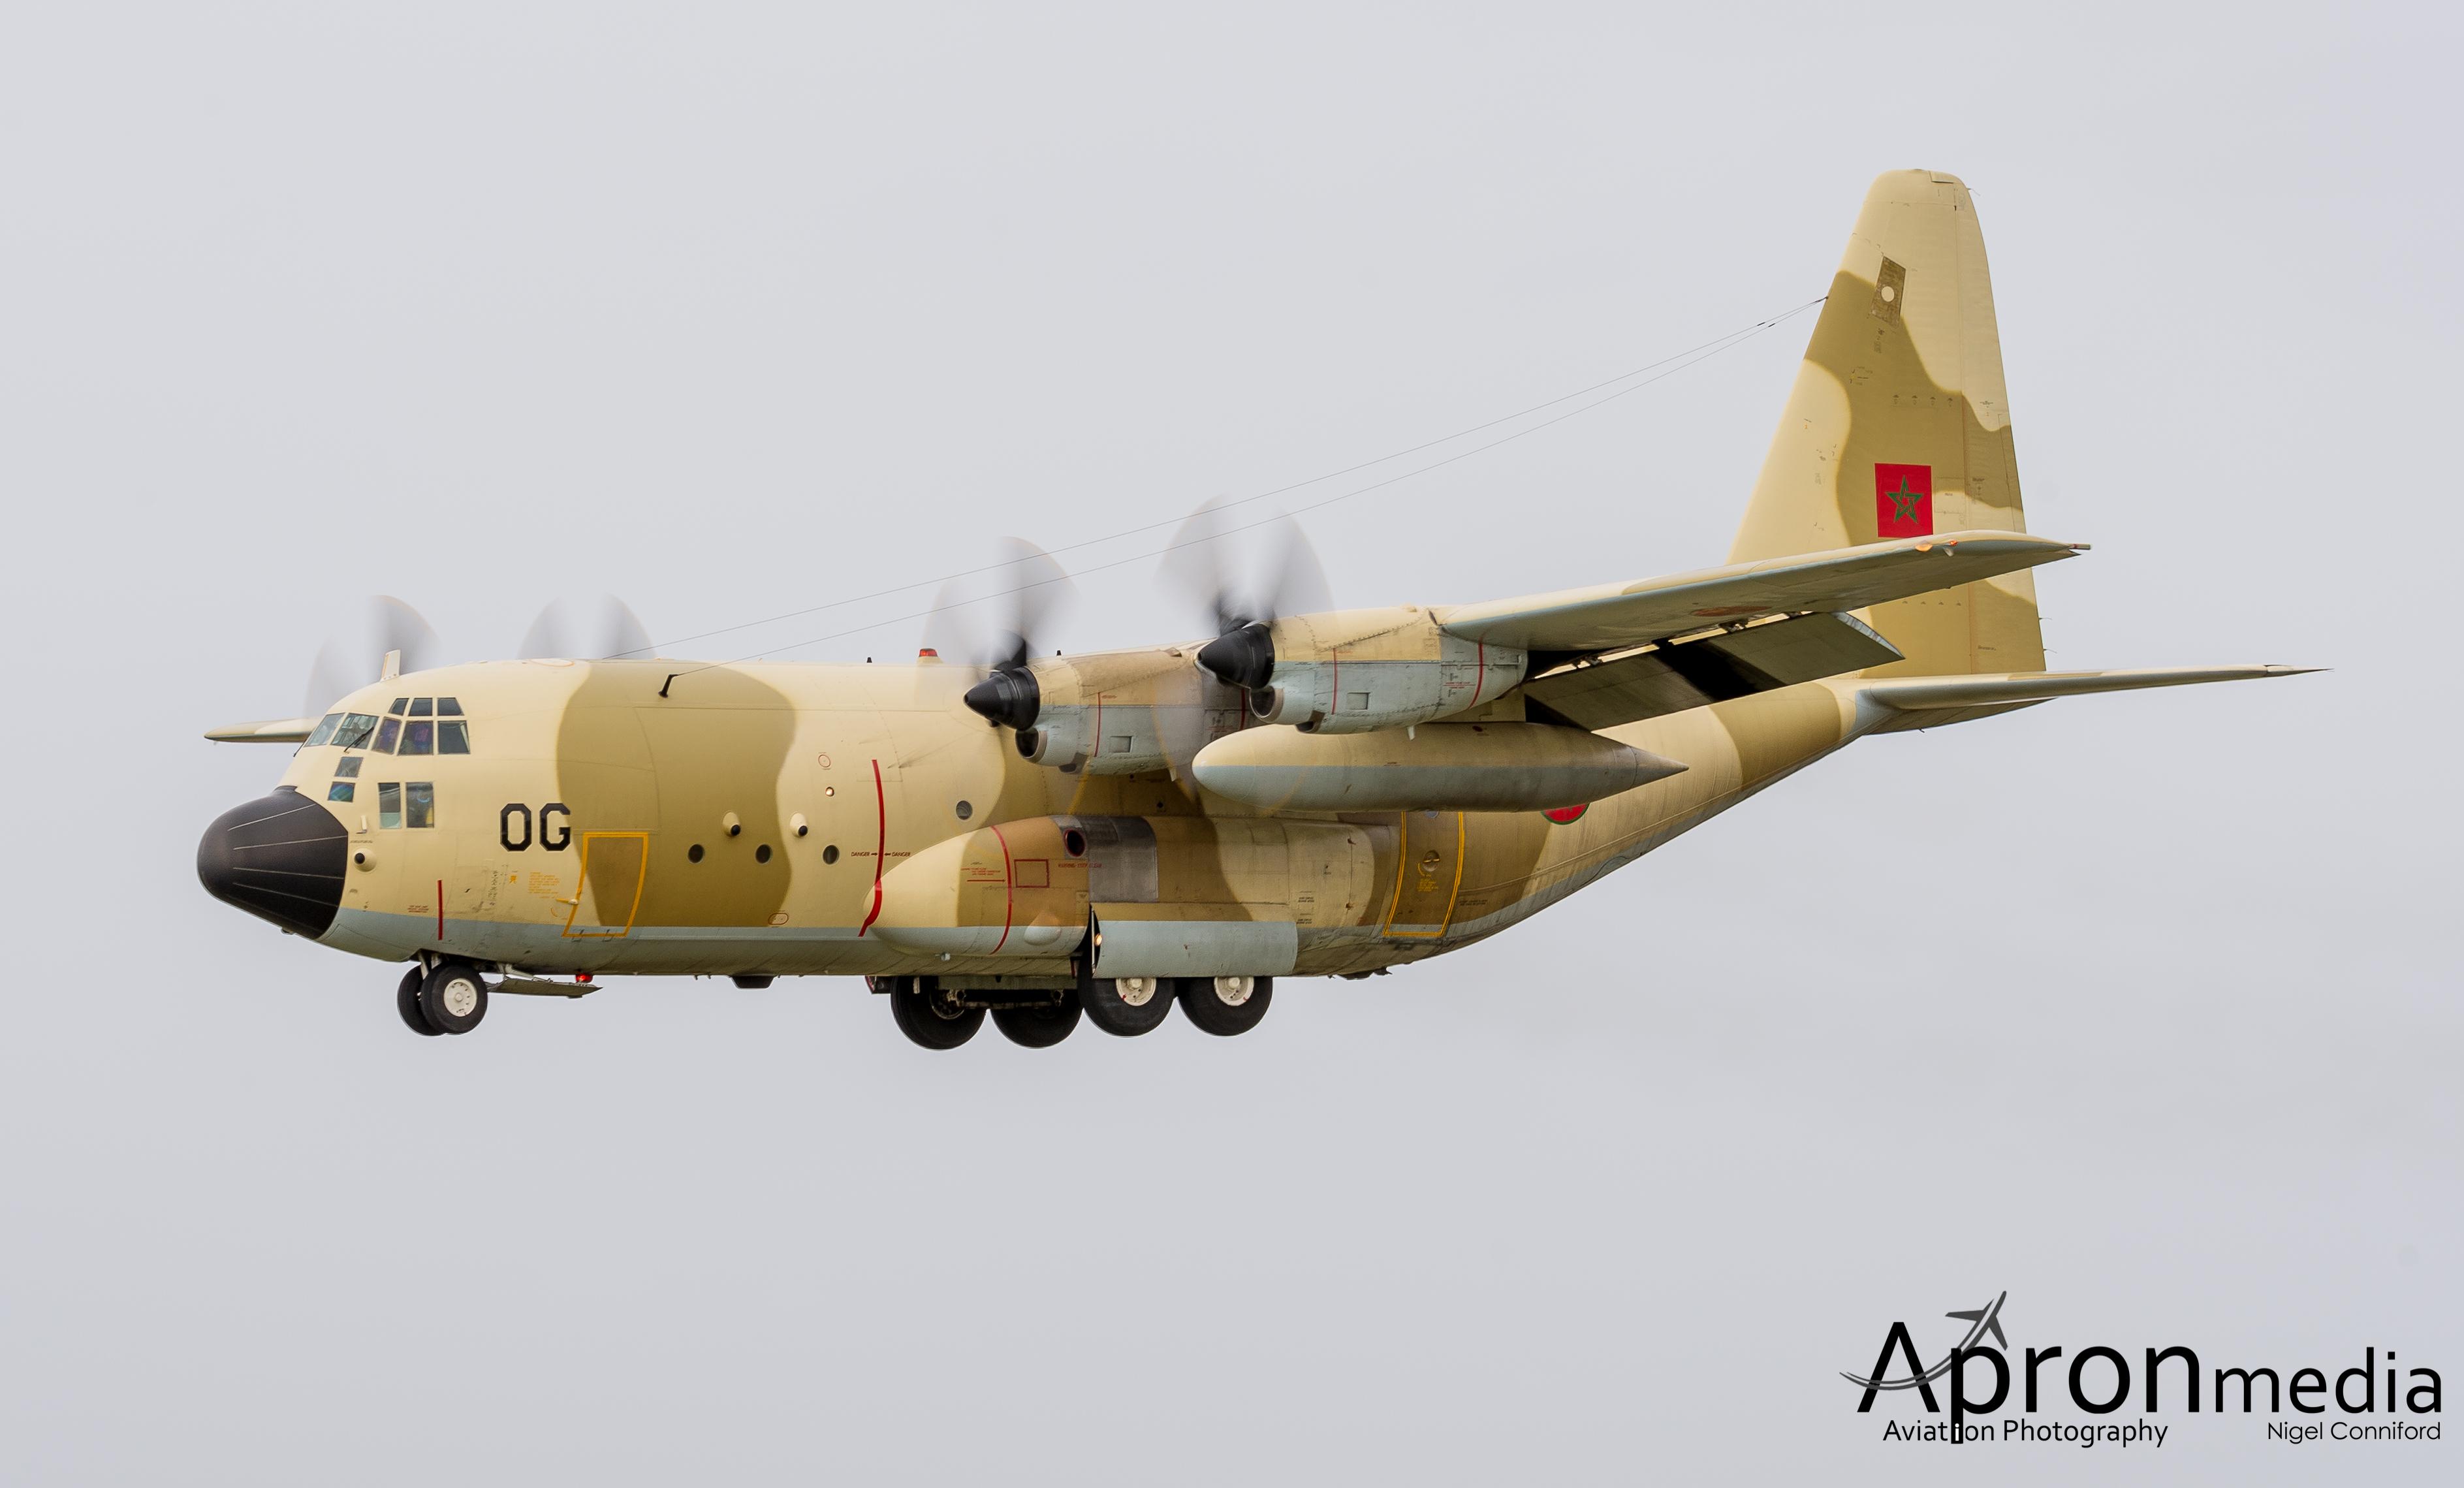 FRA: Photos d'avions de transport - Page 21 16060963664_02f504965c_o